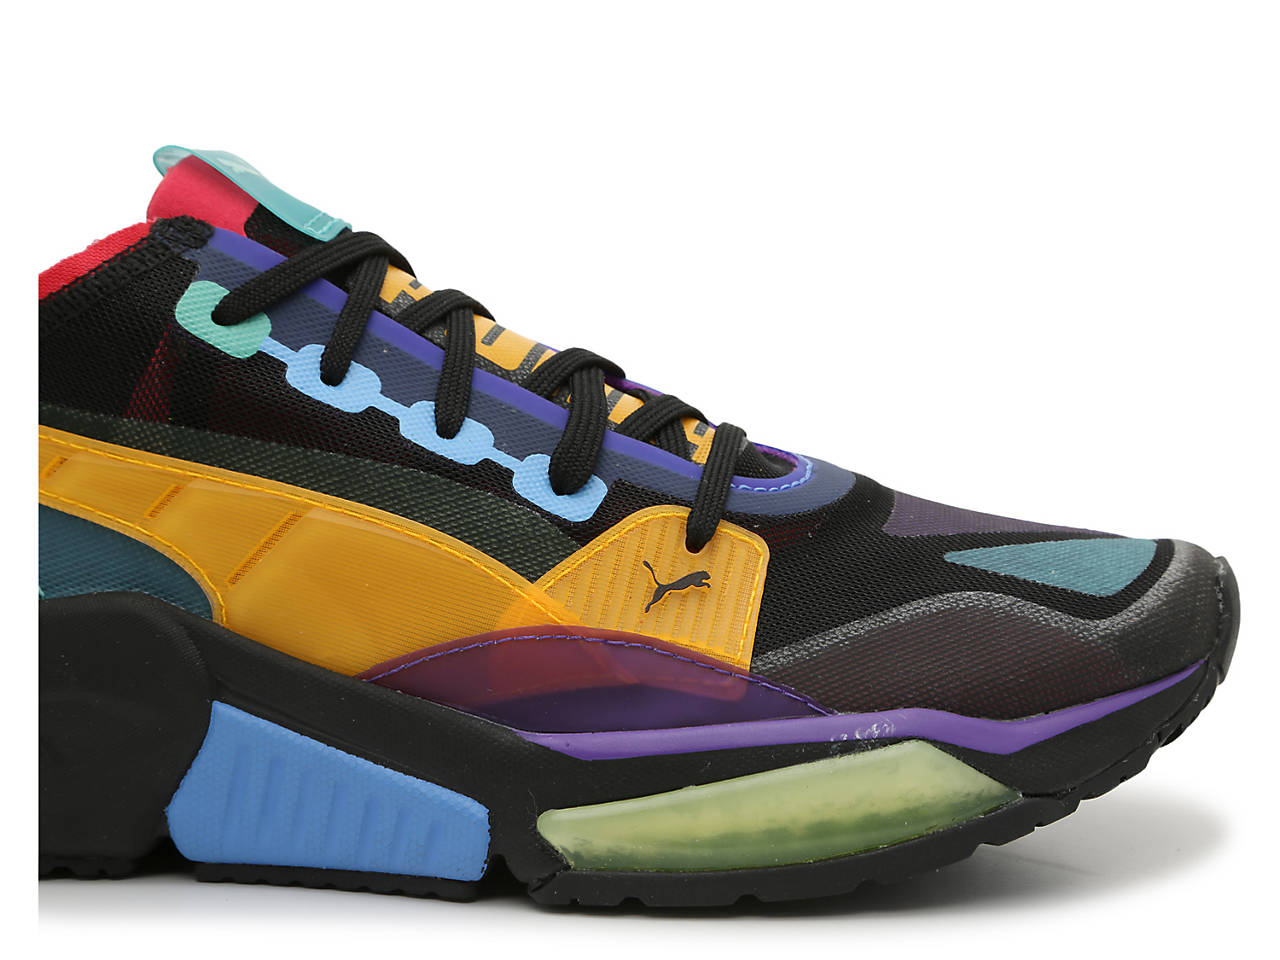 Puma LQDCell Optic Sheer Sneaker Men's Men's Shoes   DSW